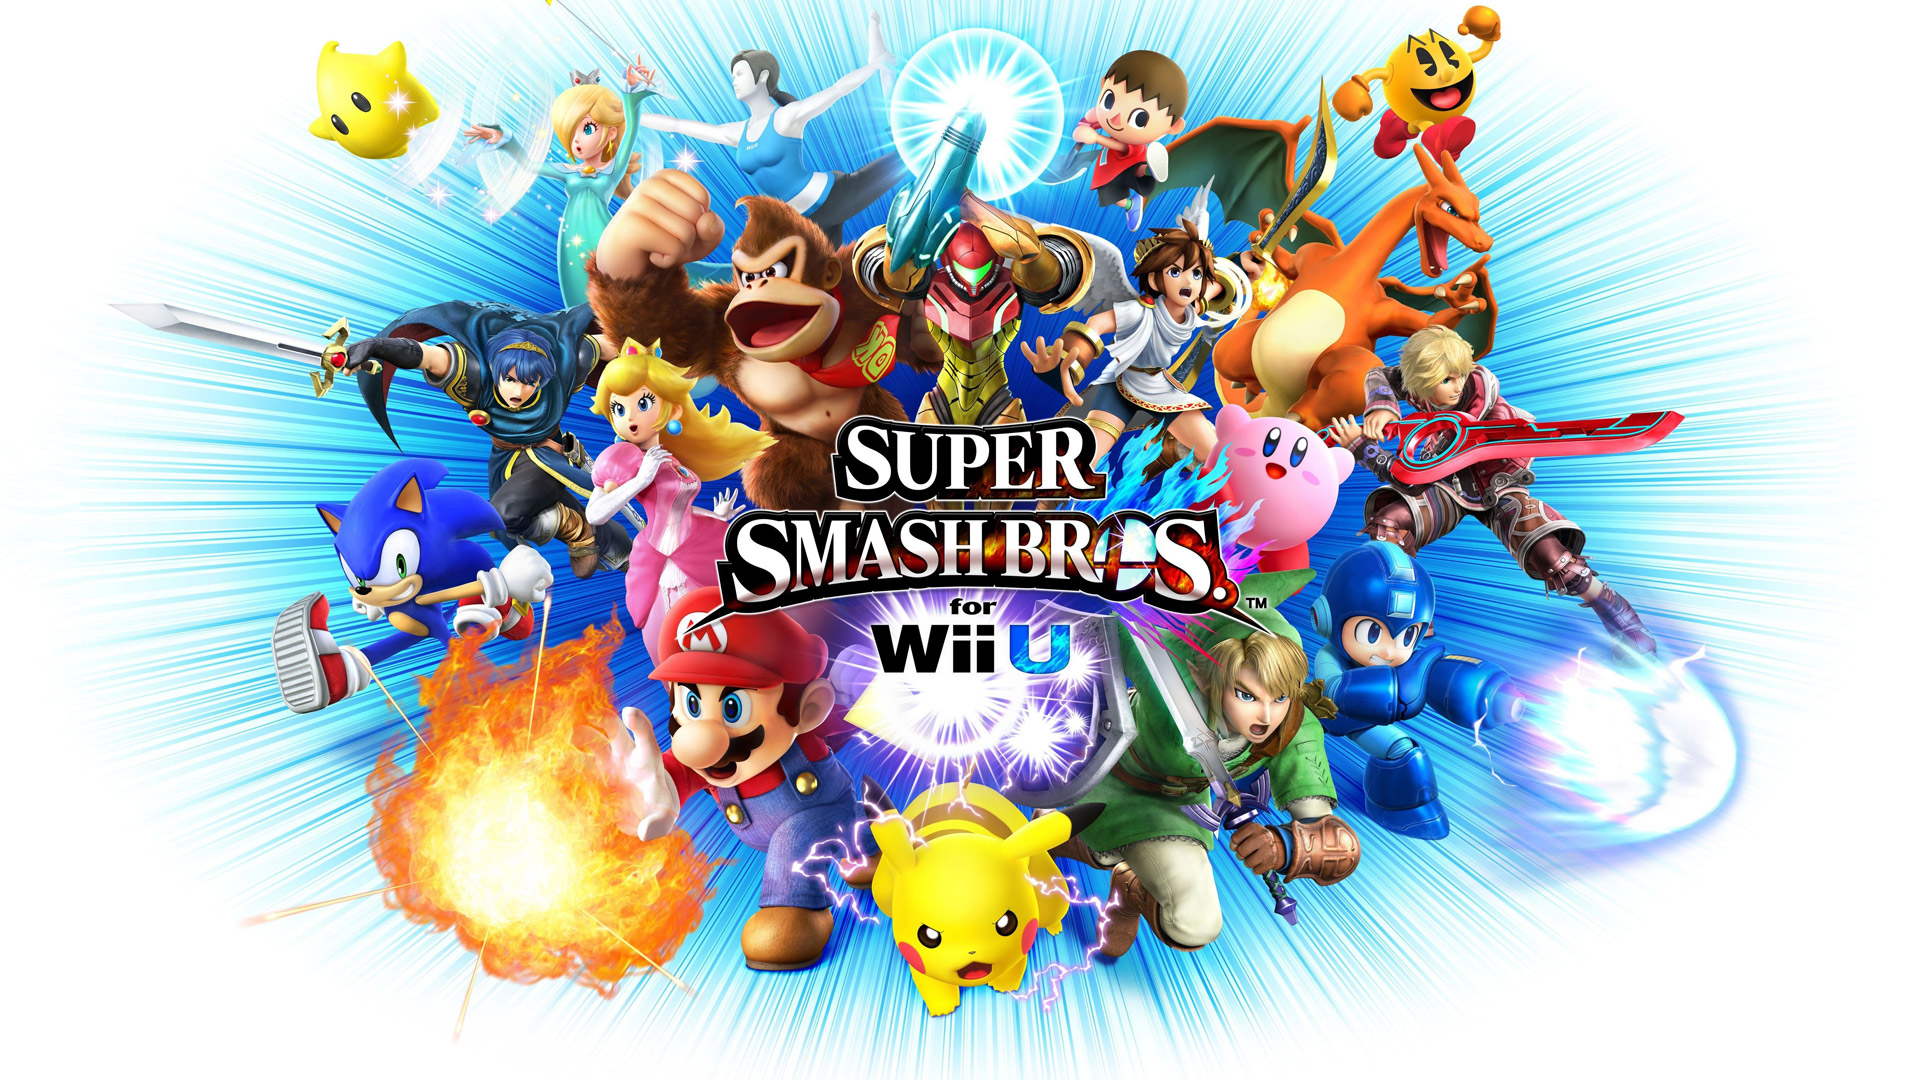 Free Super Smash Bros. for Nintendo 3DS / Wii U Wallpaper in 1920x1080